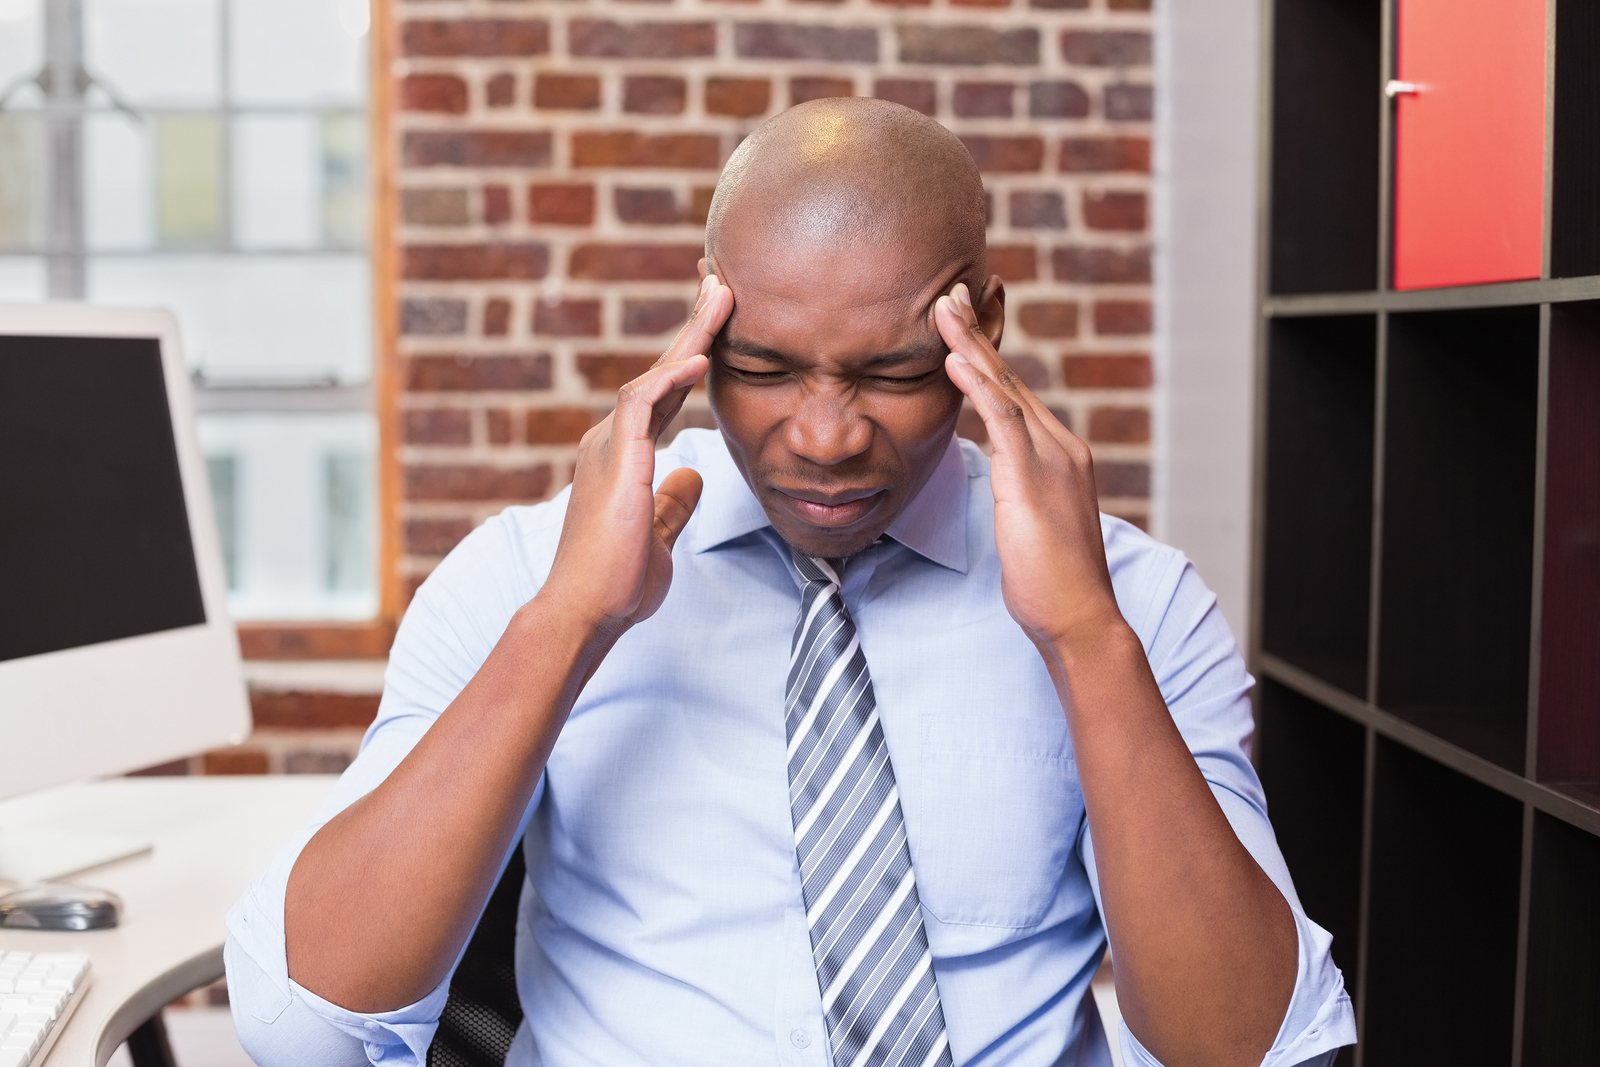 Severe Headache Emergency Room Treatment Fast Headache